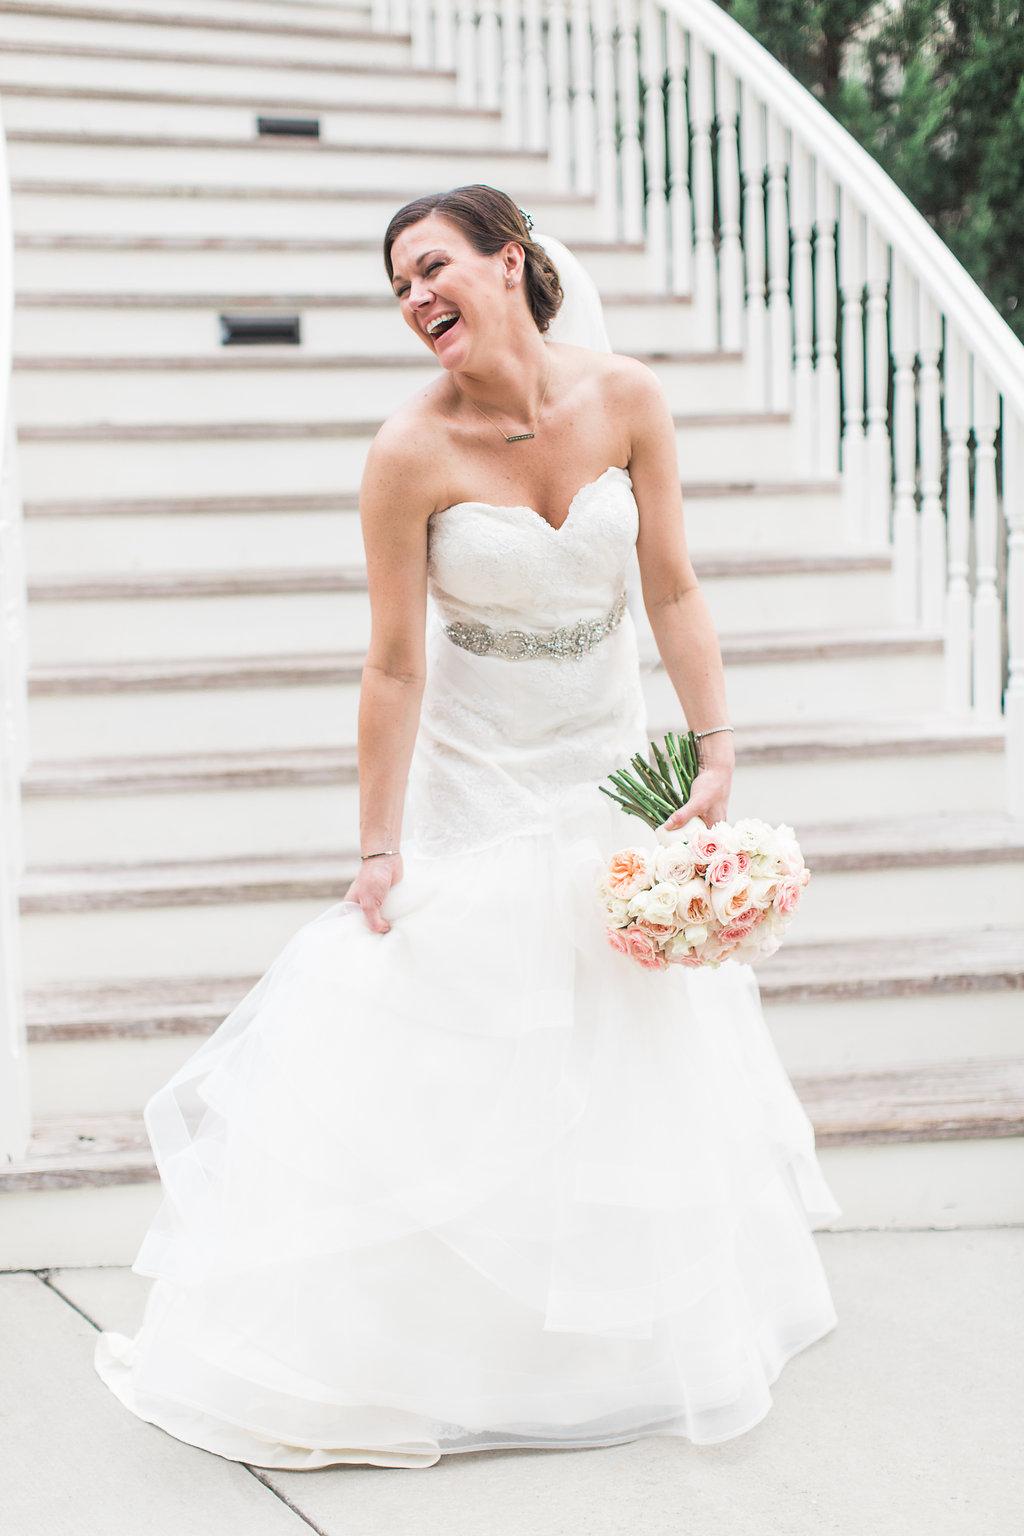 apt-b-photography-ivory-and-beau-bridal-boutique-savannah-florist-savannah-wedding-flowers-savannah-wedding-planner-tybee-island-wedding-chapel-wedding-rose-bouquet-blush-wedding-tybee-wedding-savannah-weddings-savannah-flowers-34.jpg